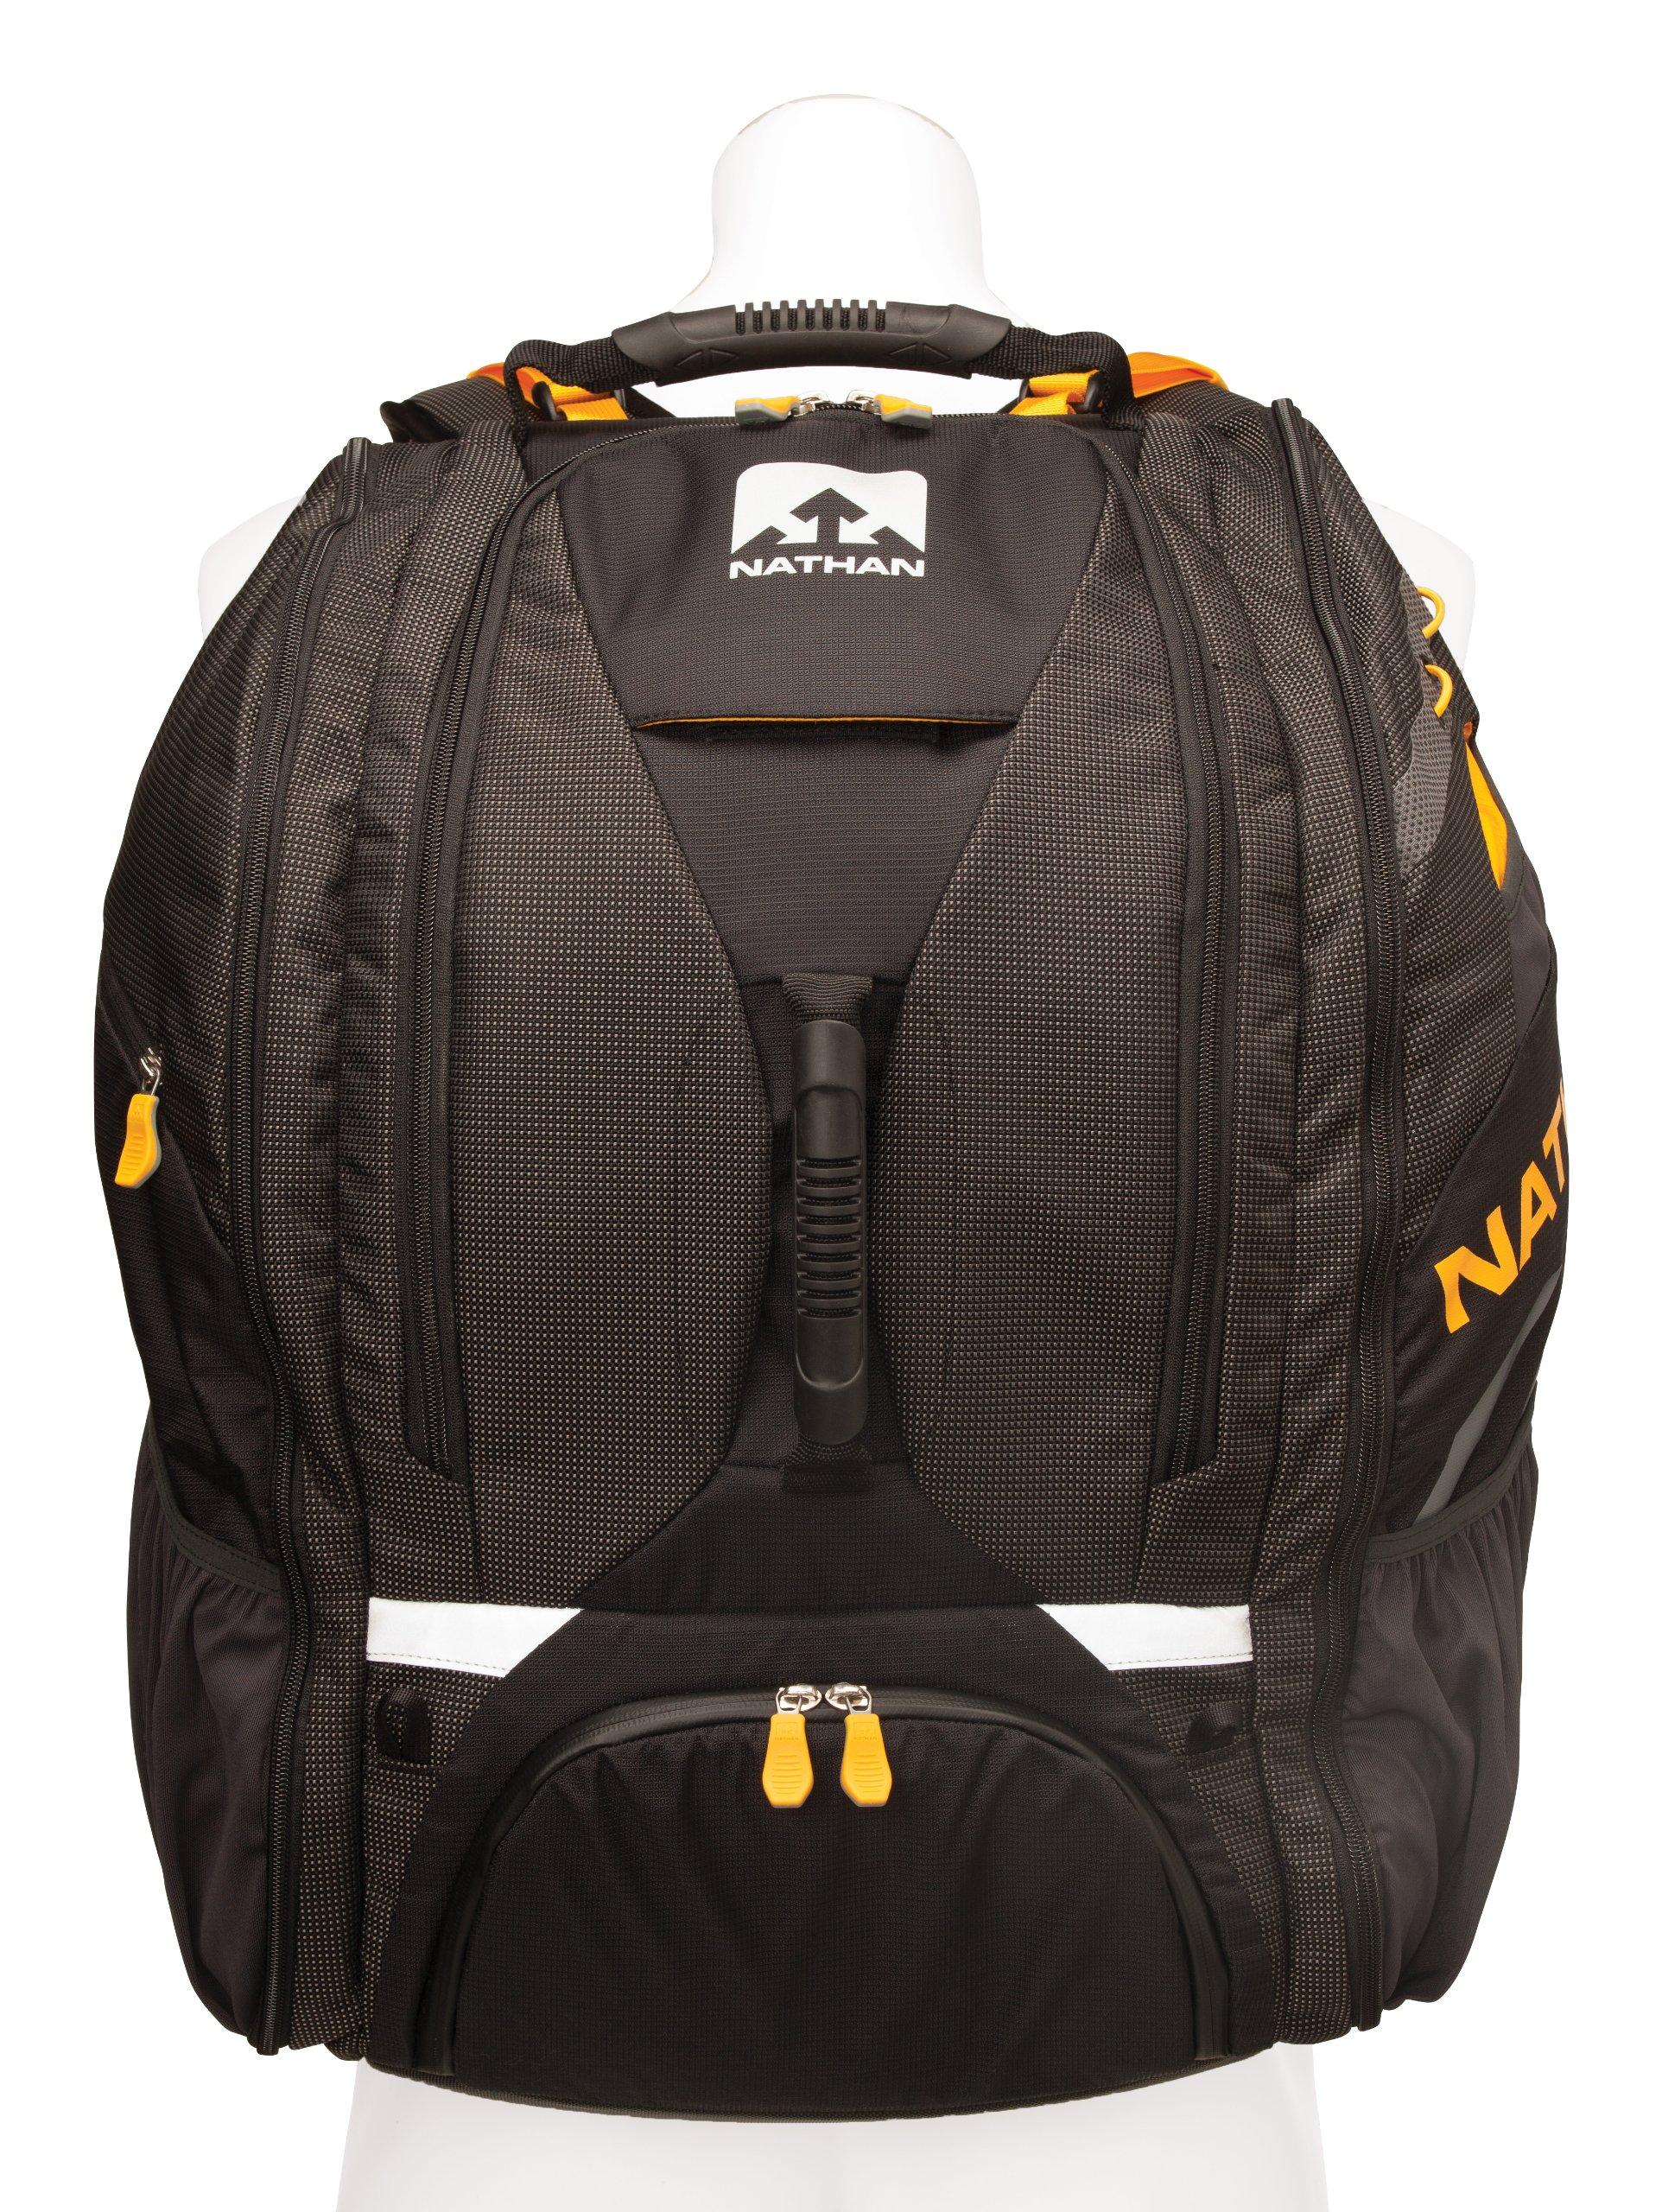 Nathan Mission Control Bag, Black by Nathan (Image #4)